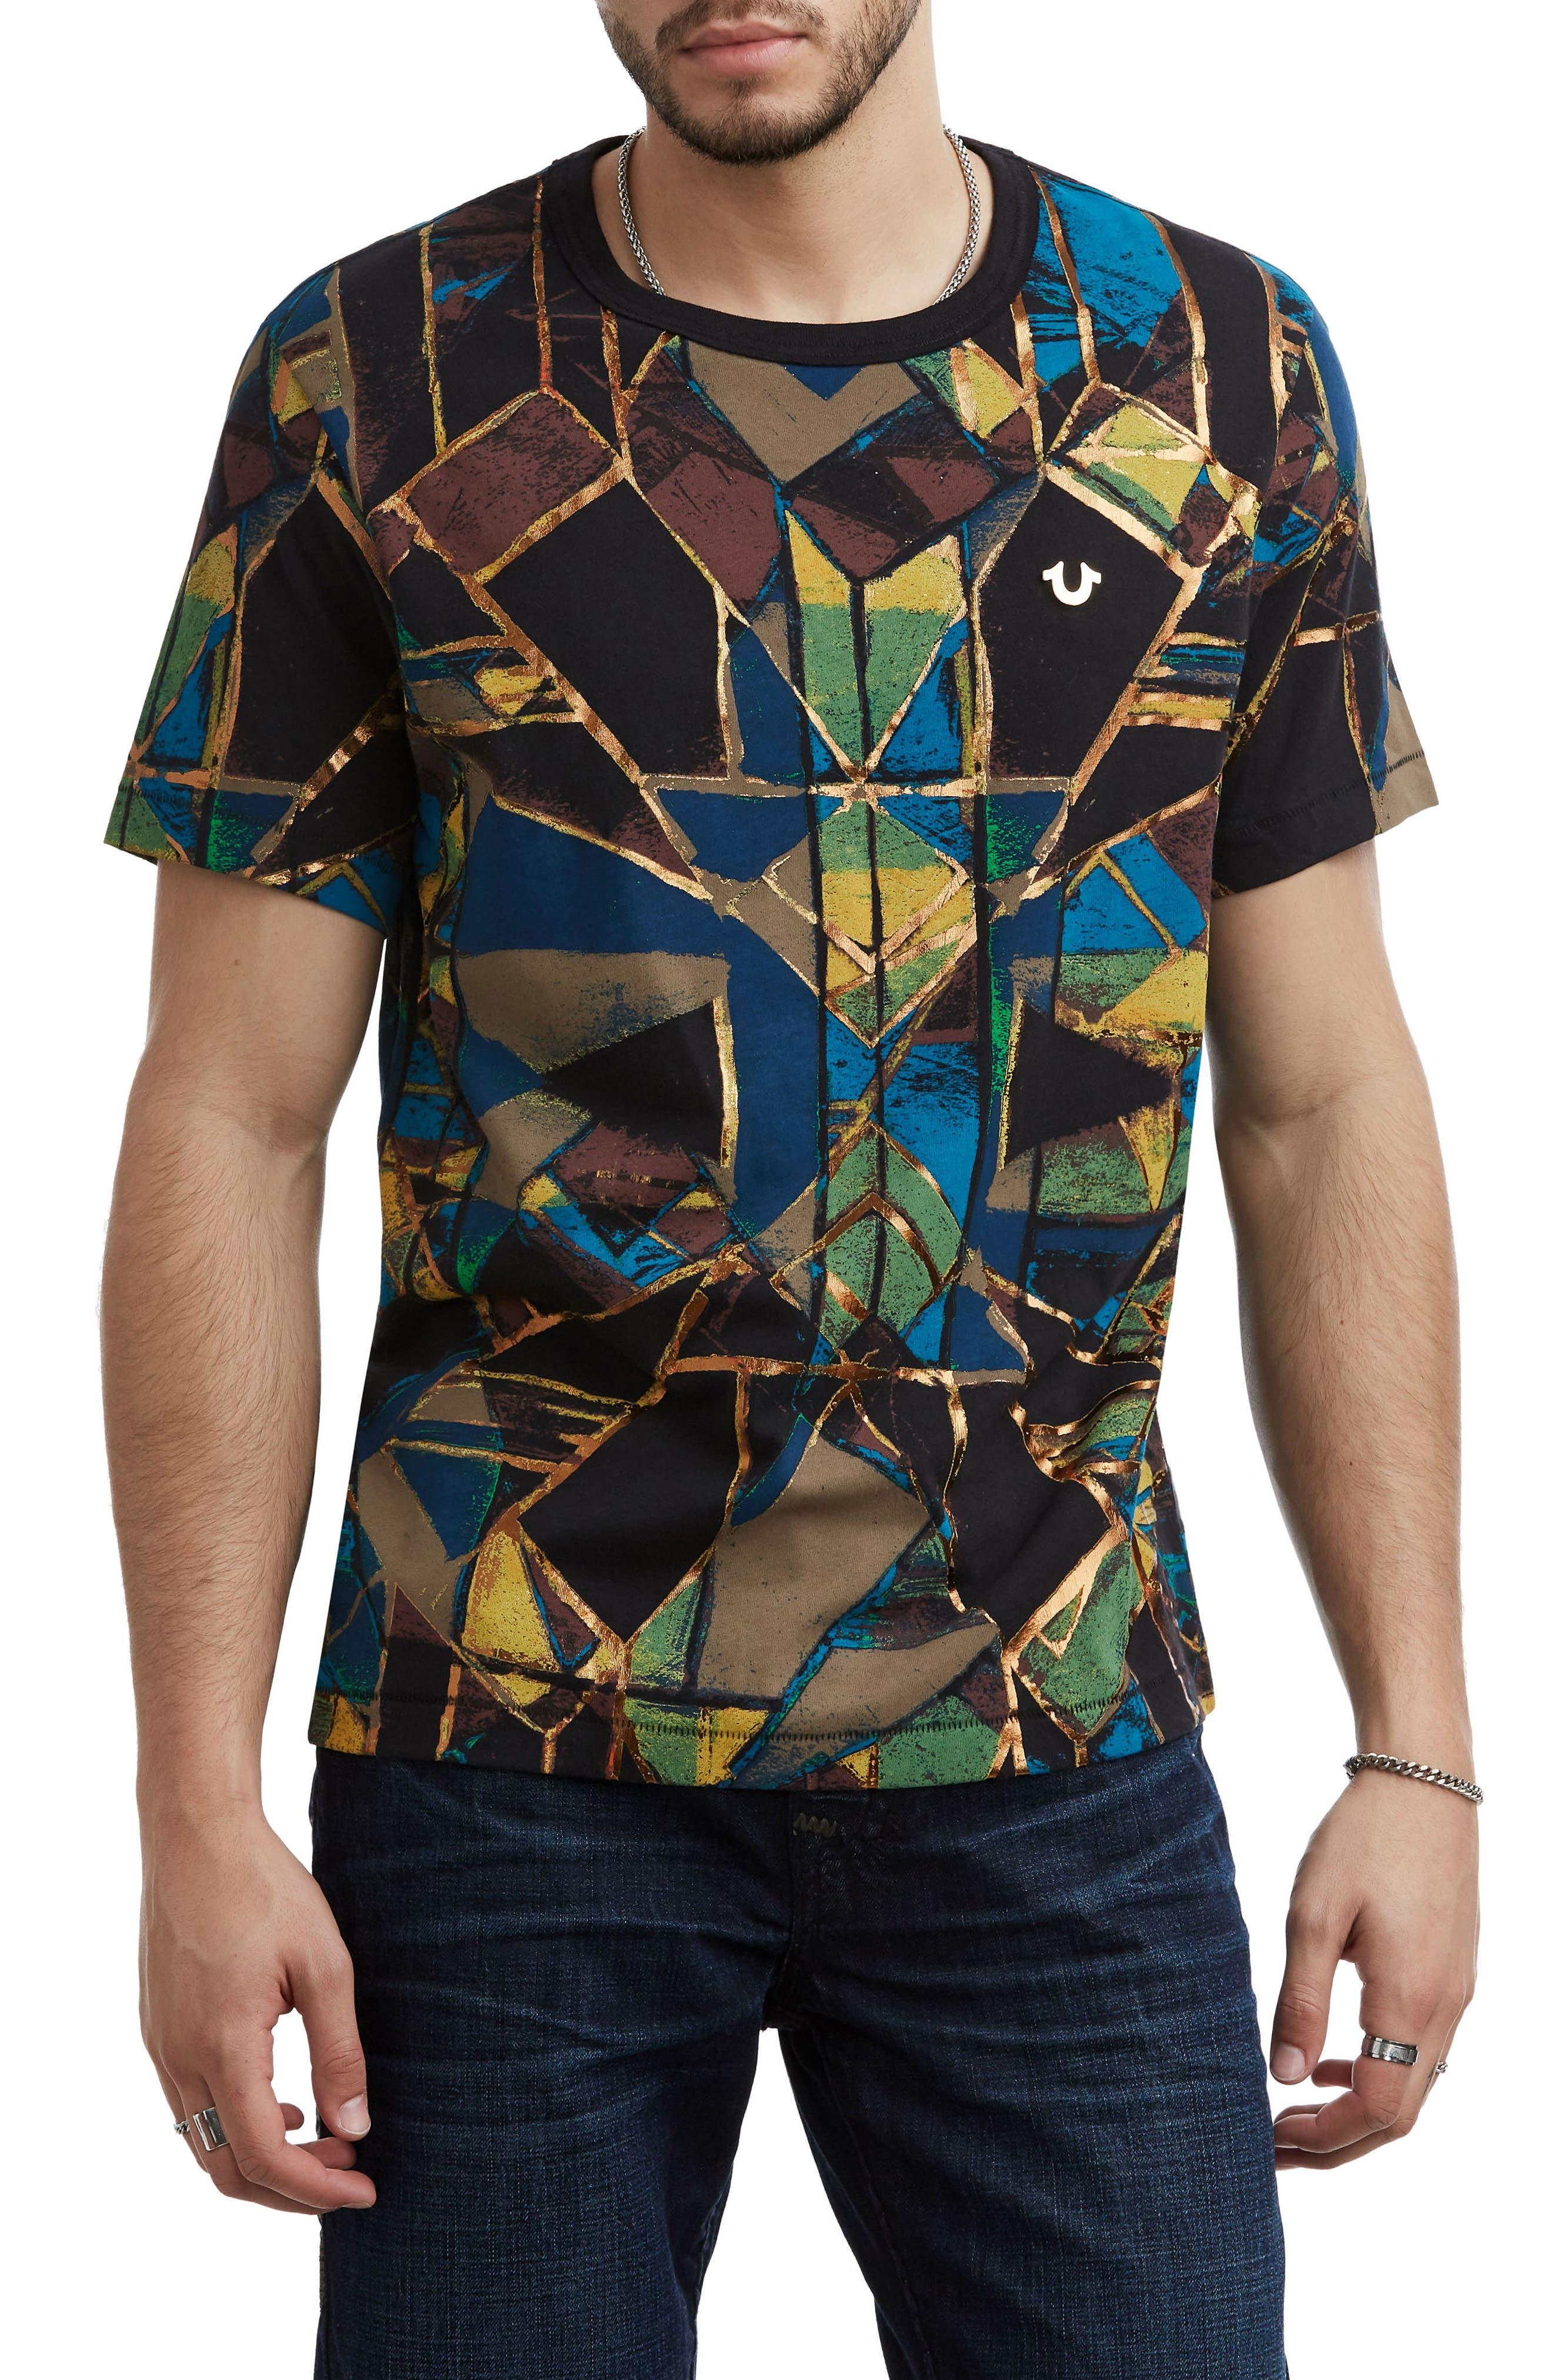 Limelight Graphic T-Shirt,                             Main thumbnail 1, color,                             BLACK MULTI